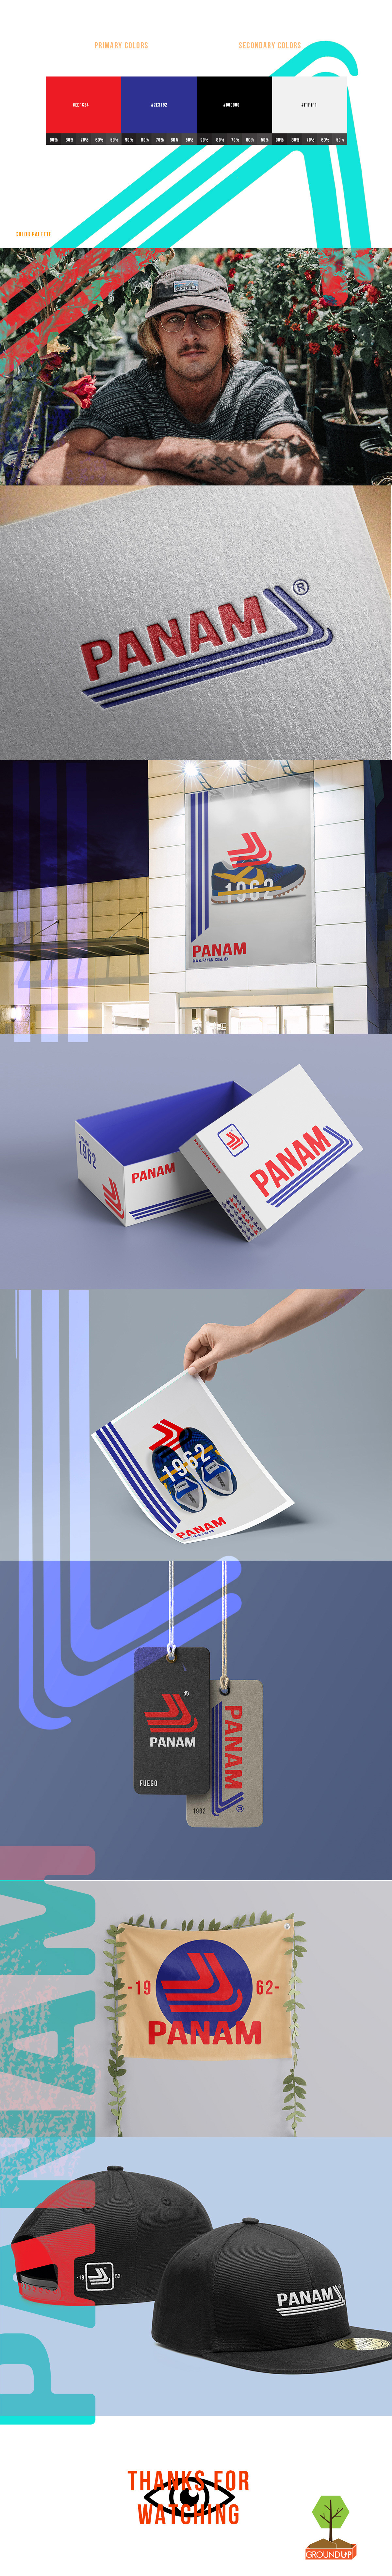 panam tennis Fashion  brands logo redesign up ground